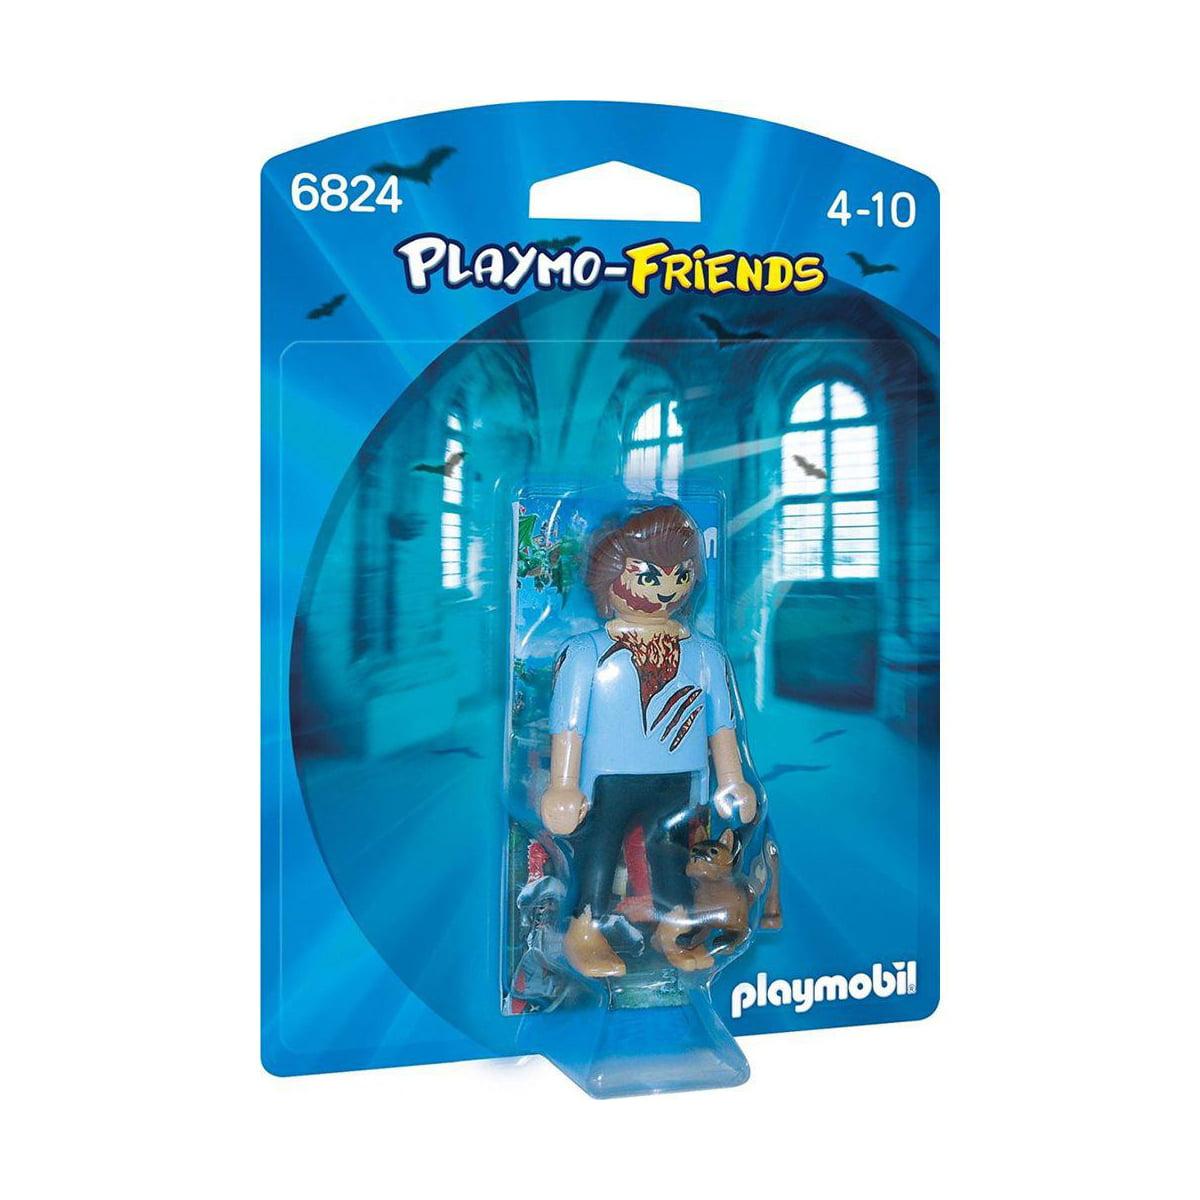 PLAYMOBIL -  PLAYMO-FRIENDS - 6824